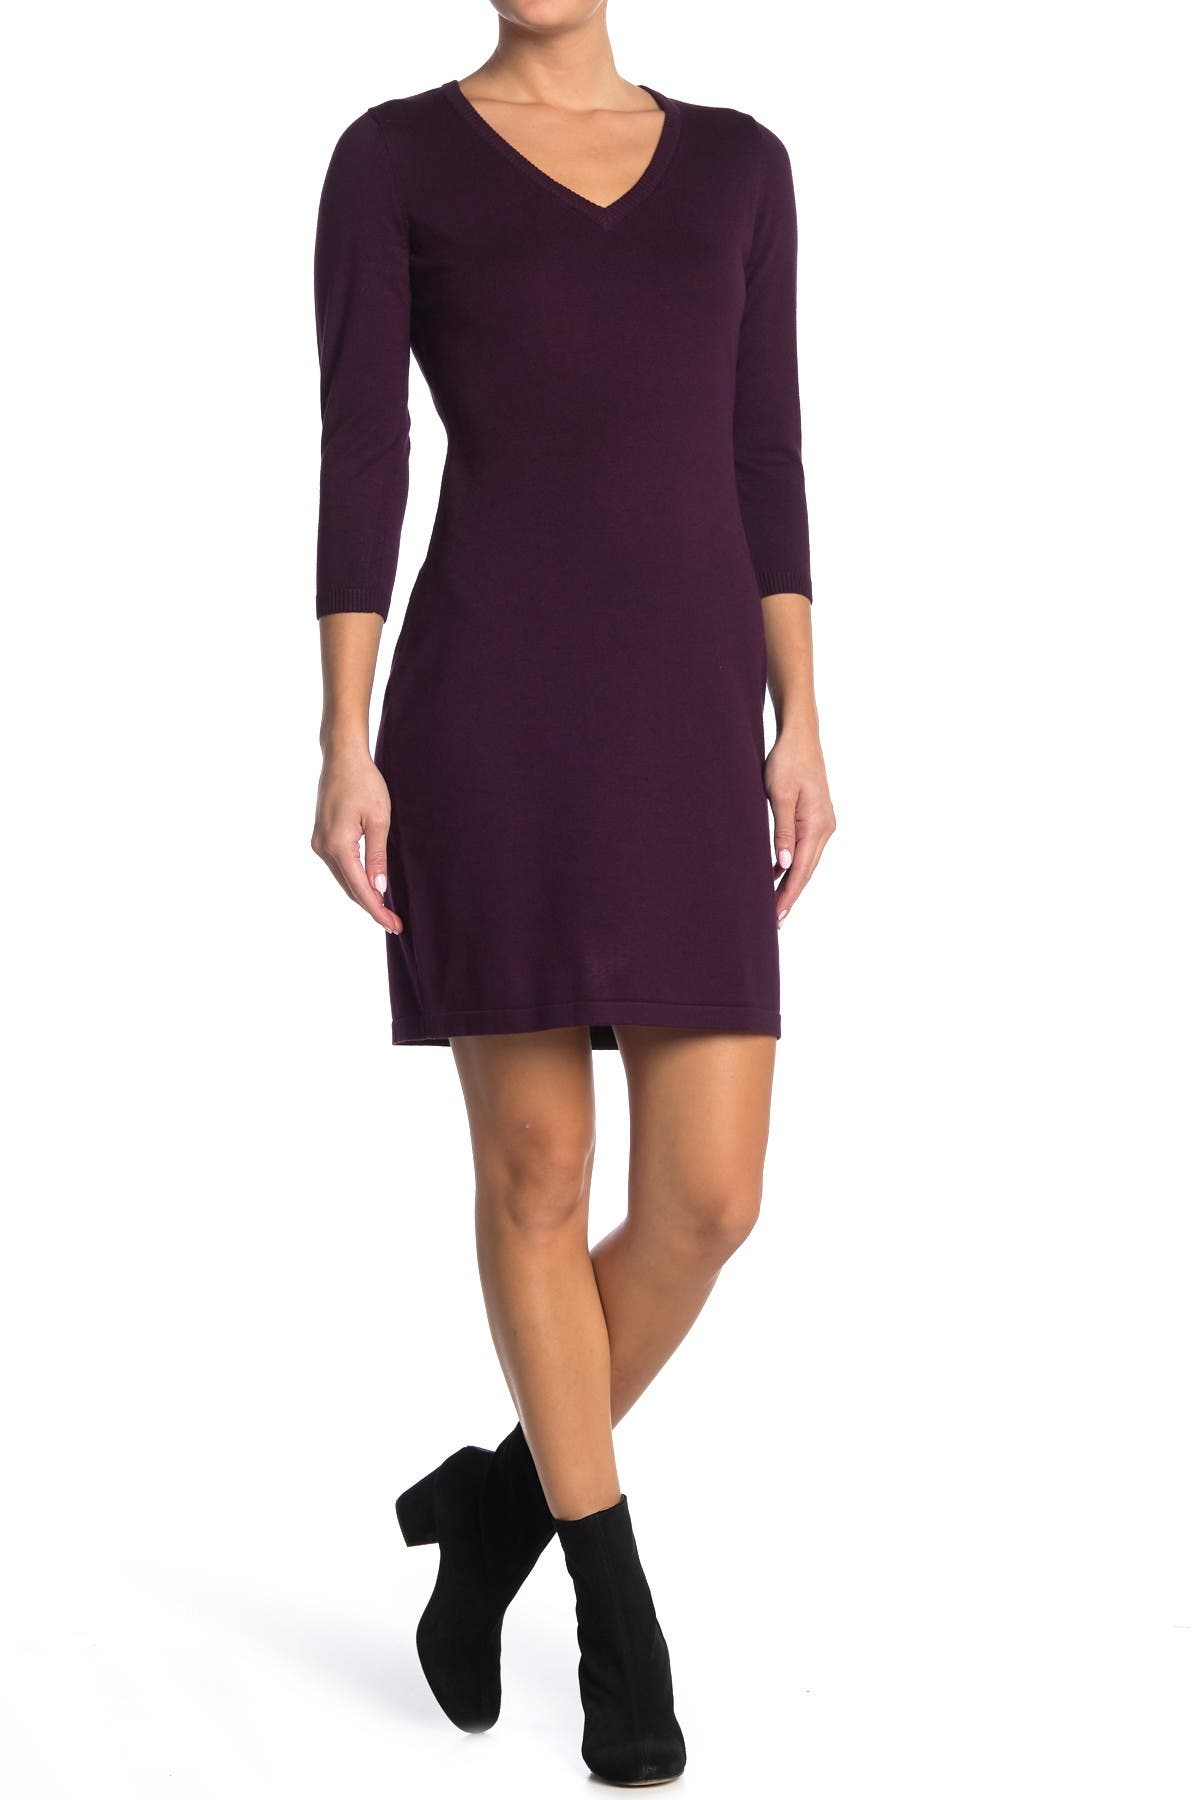 Image of Calvin Klein 3/4 Length Sleeve Sweater Dress